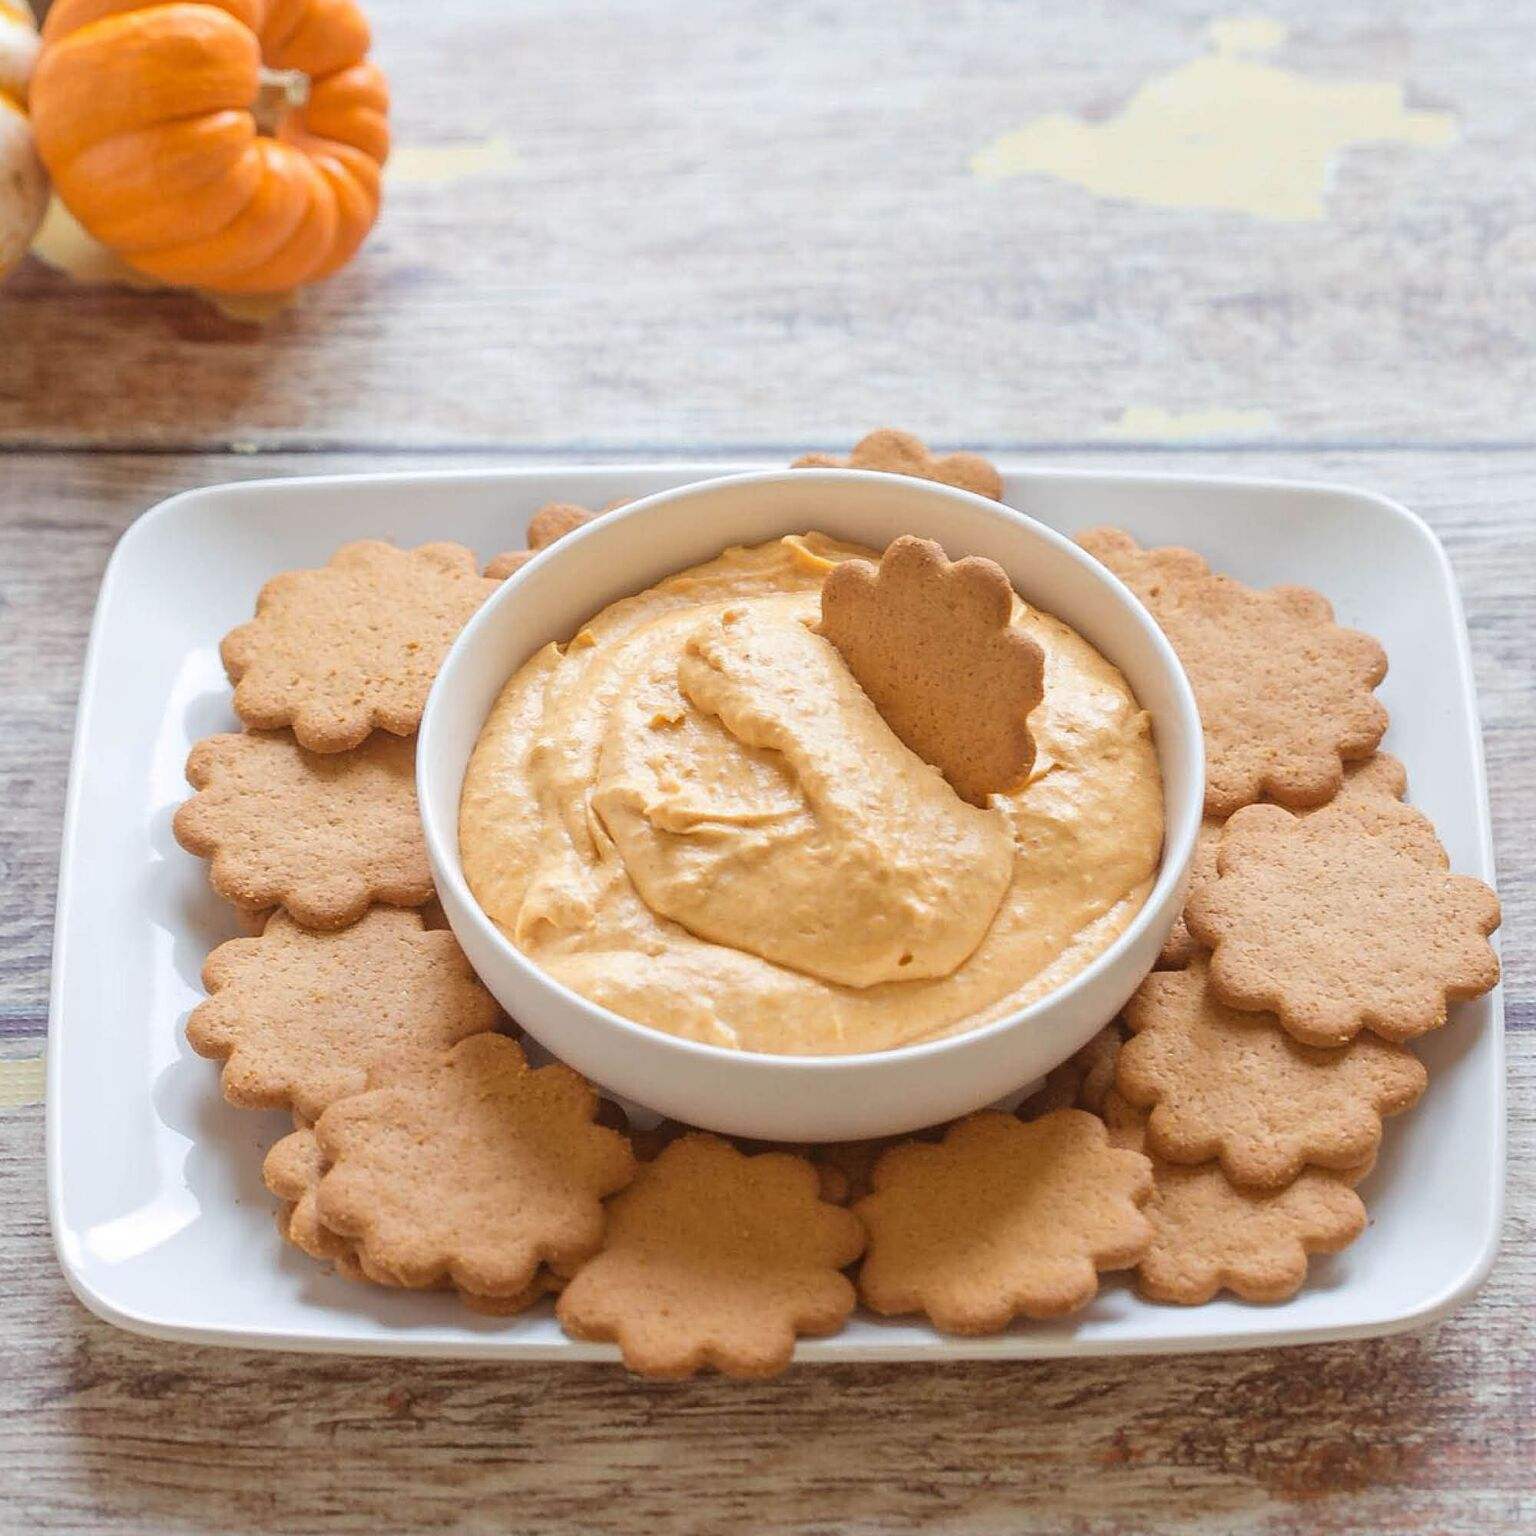 Pumpkin Dip | Fall Dessert Recipe | No Bake Dessert | 5 Ingredients or Less | Food Made Simple